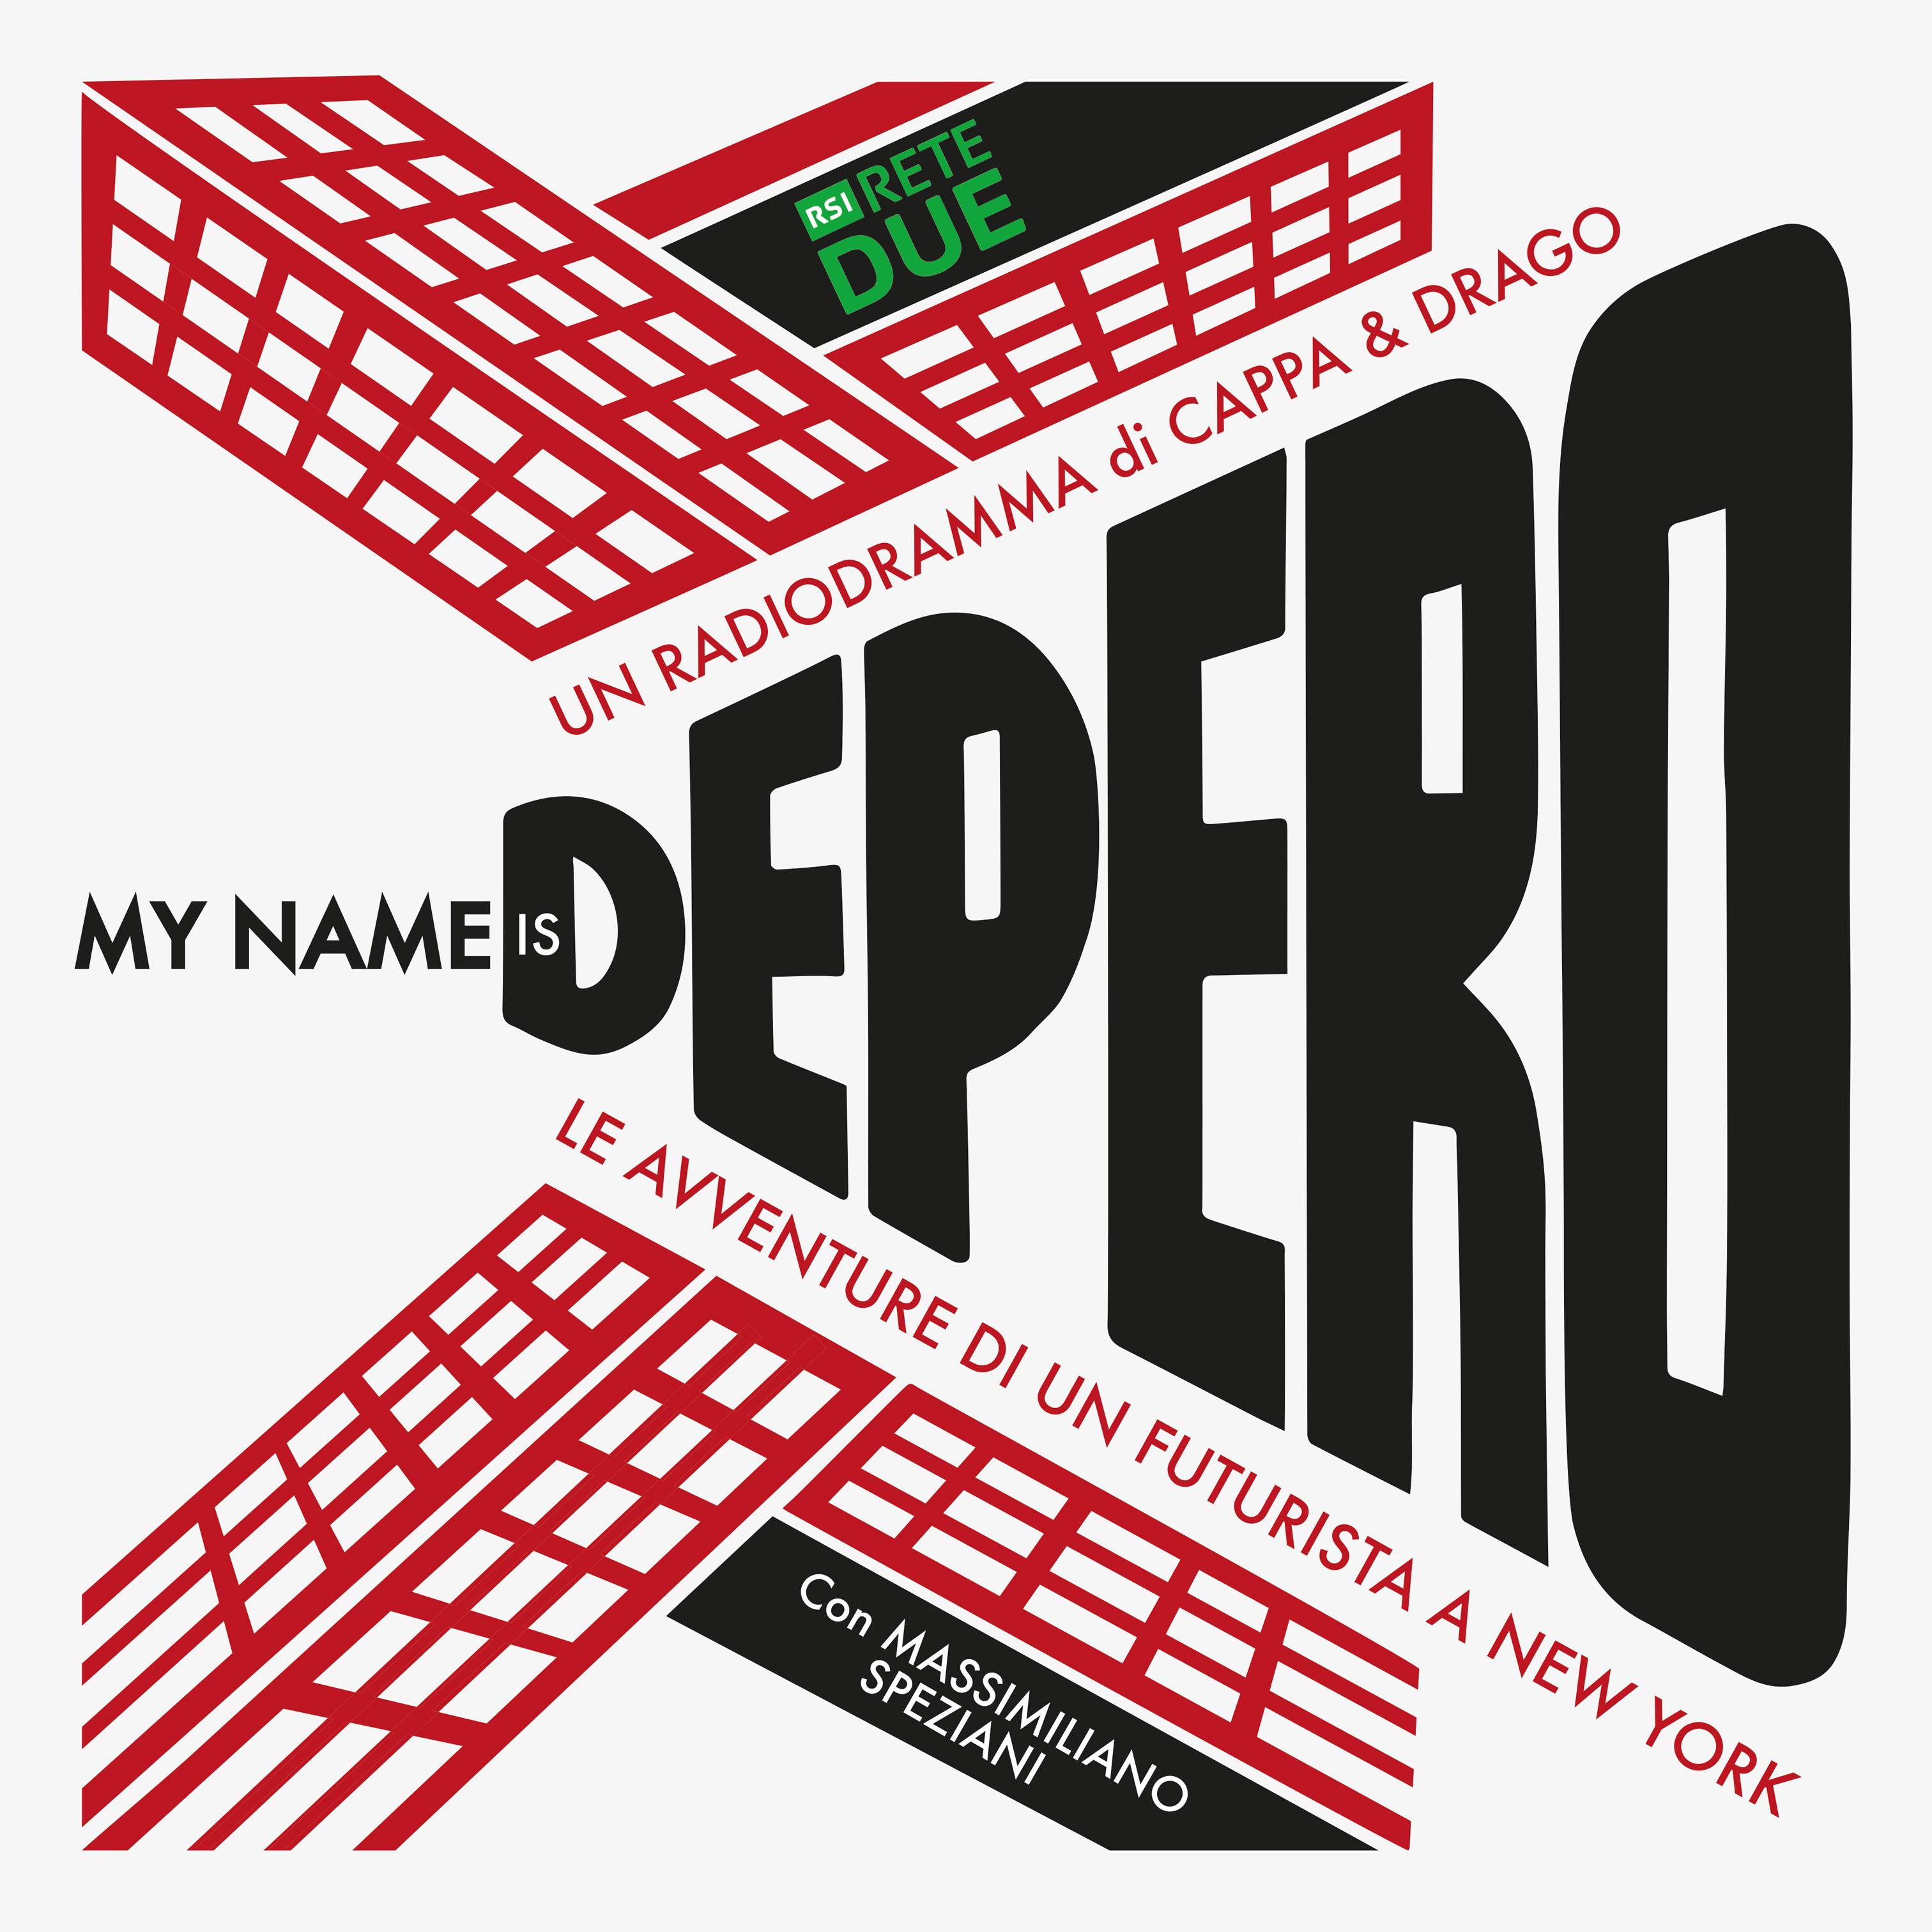 <span>My name is Depero</span>